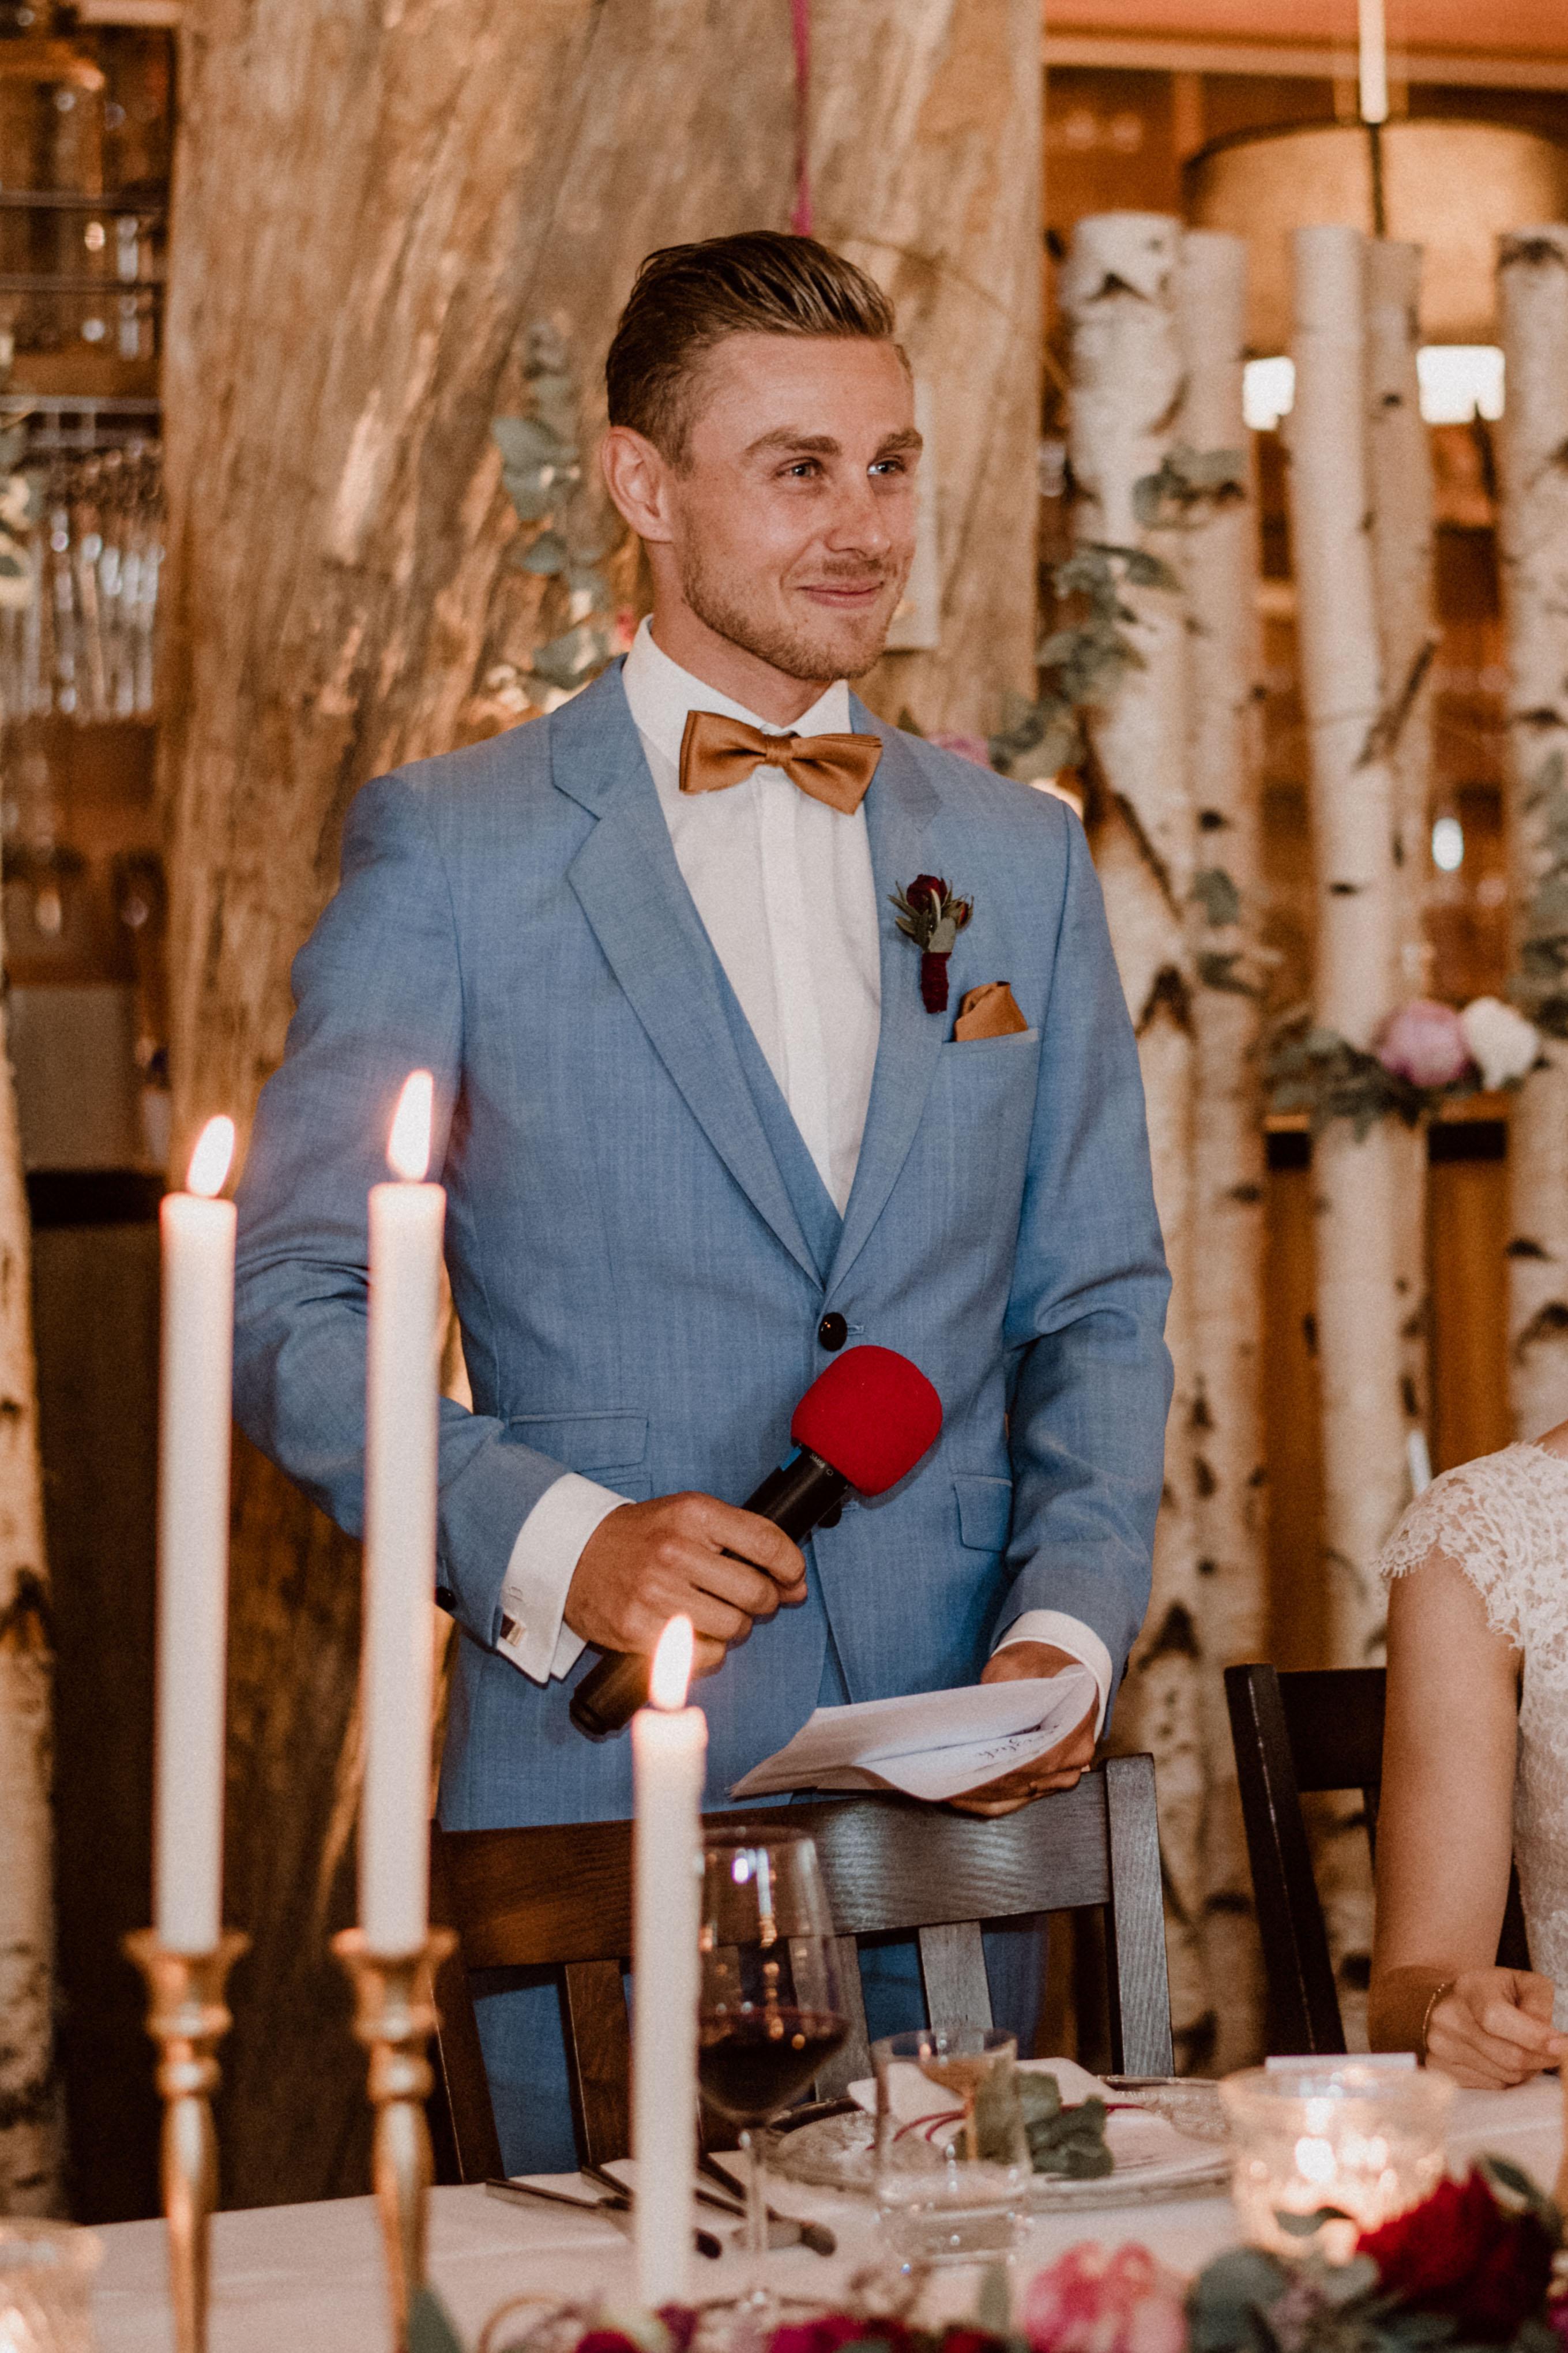 ansprache location sonja poehlmann photography weddings muenchen bayern